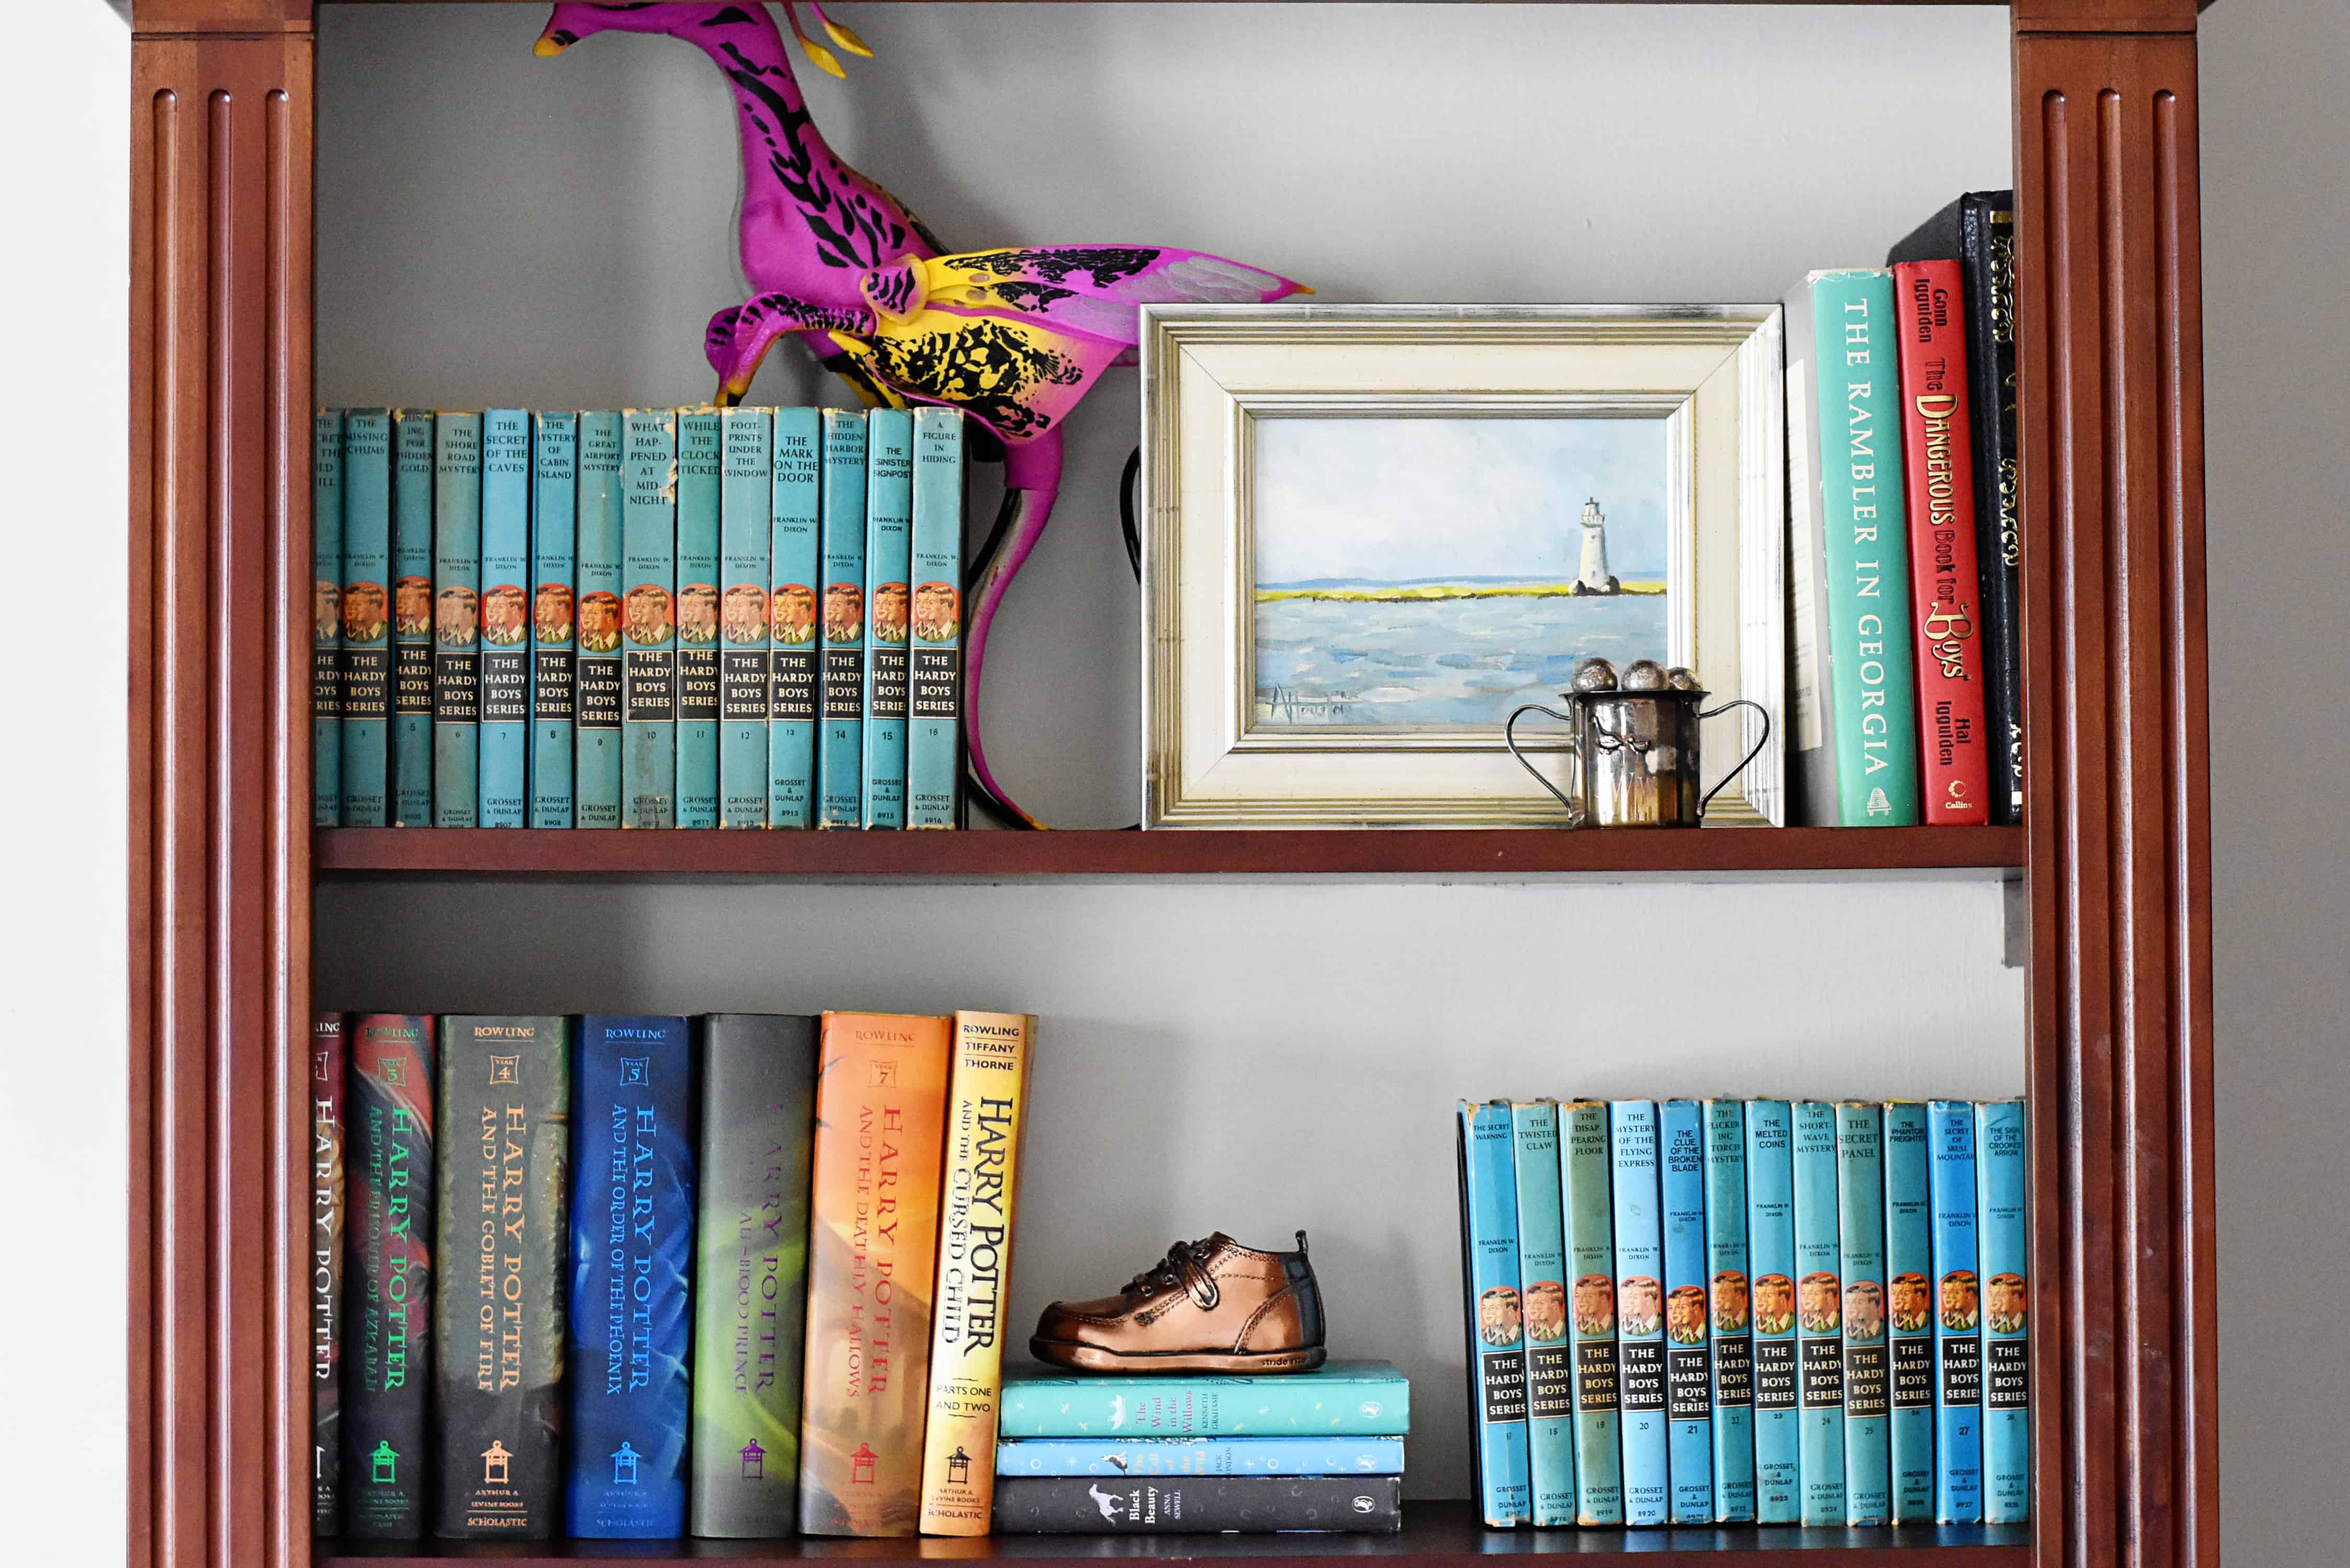 hayneedle kidkraftracecarbookshelf bookshelf product kidkraft master racecar bookcase bookcases boys cfm